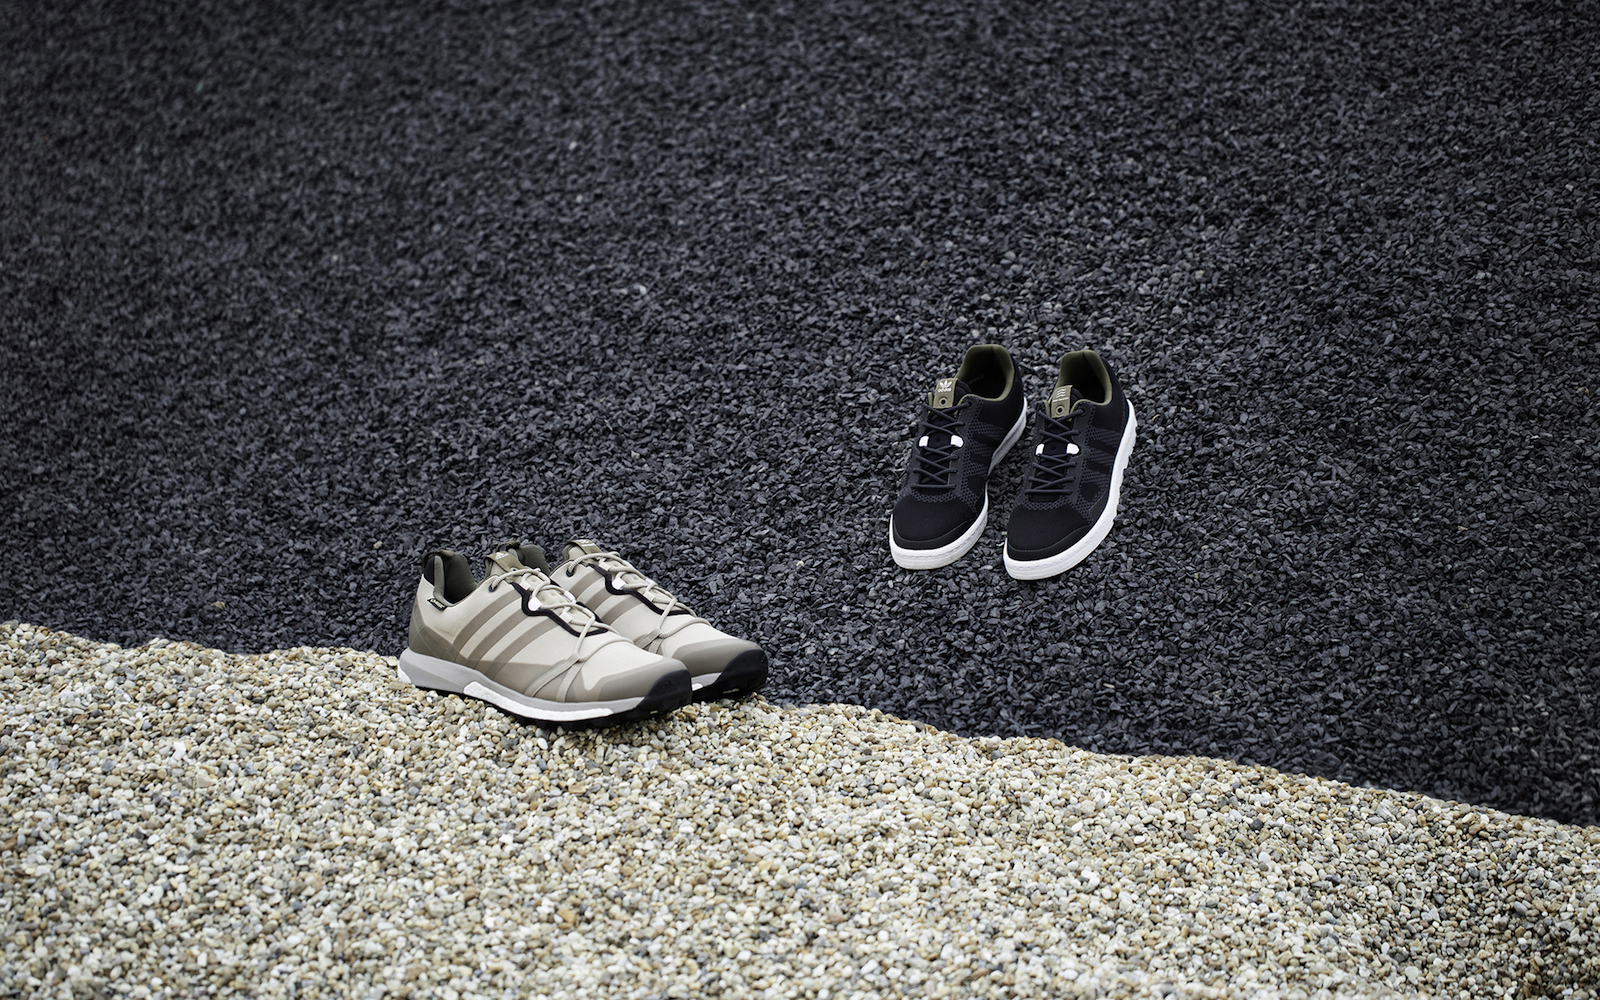 big sale 089ad d978d adidas Consortium x Norse Projects Terrex Agravic   Campus 80s PK